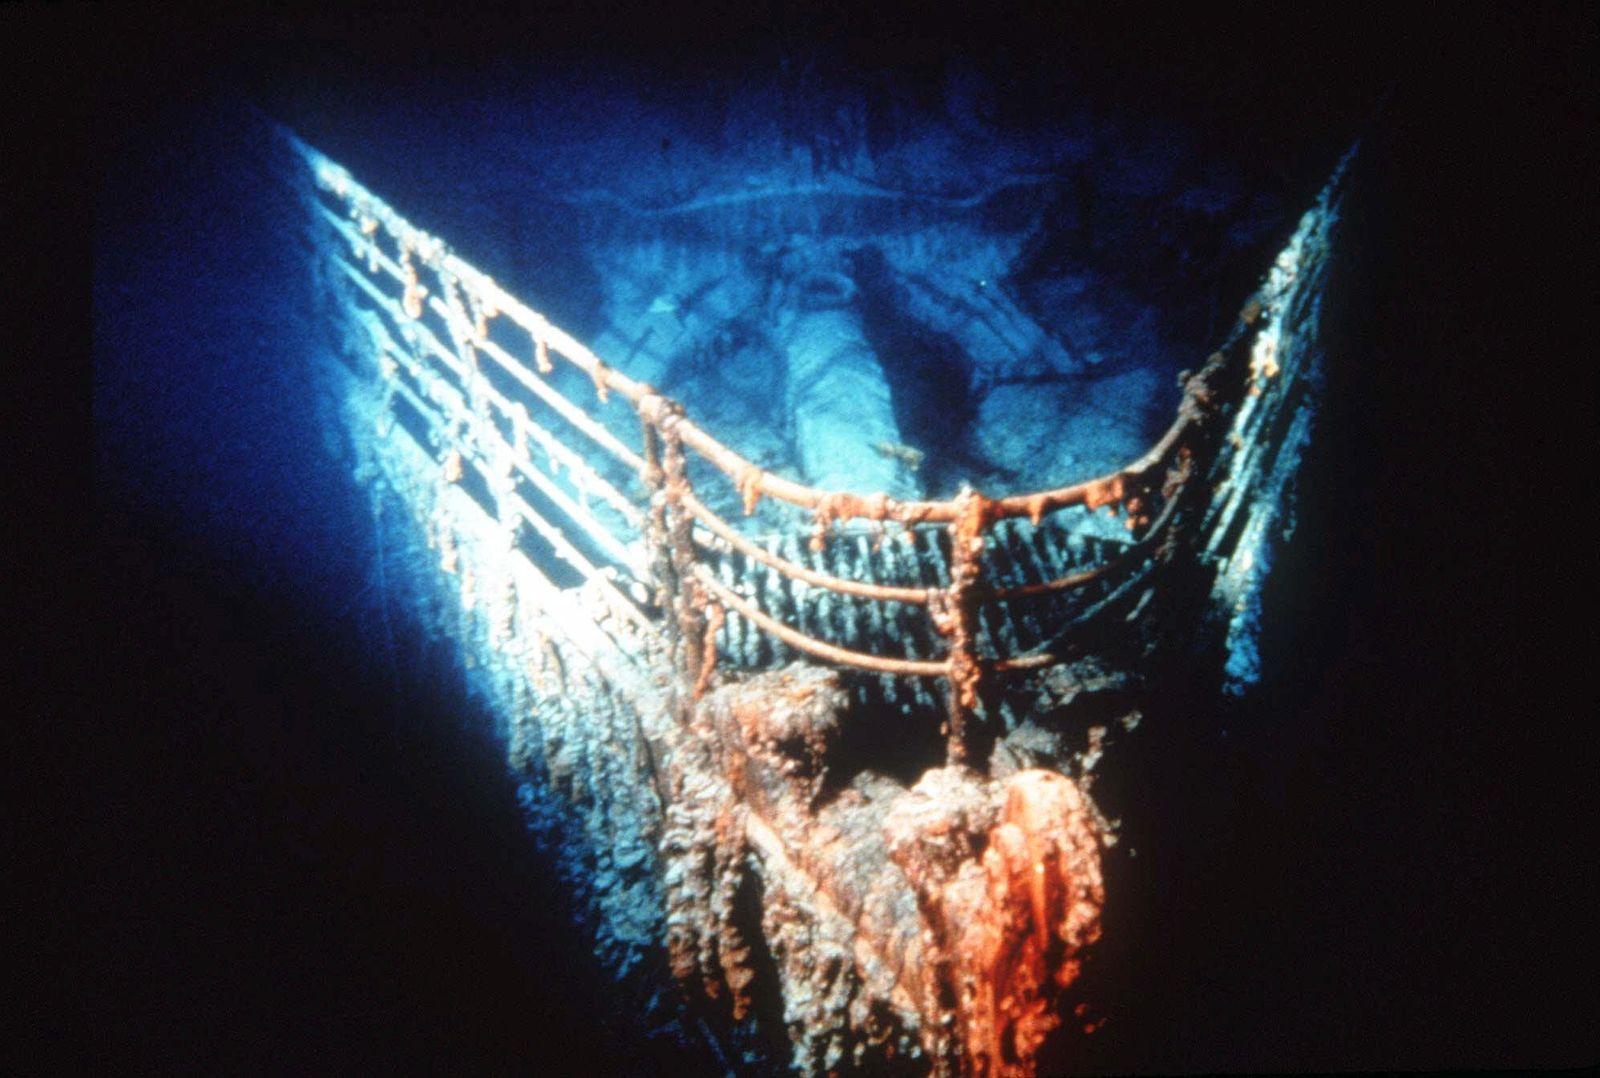 A Titanic Legacy